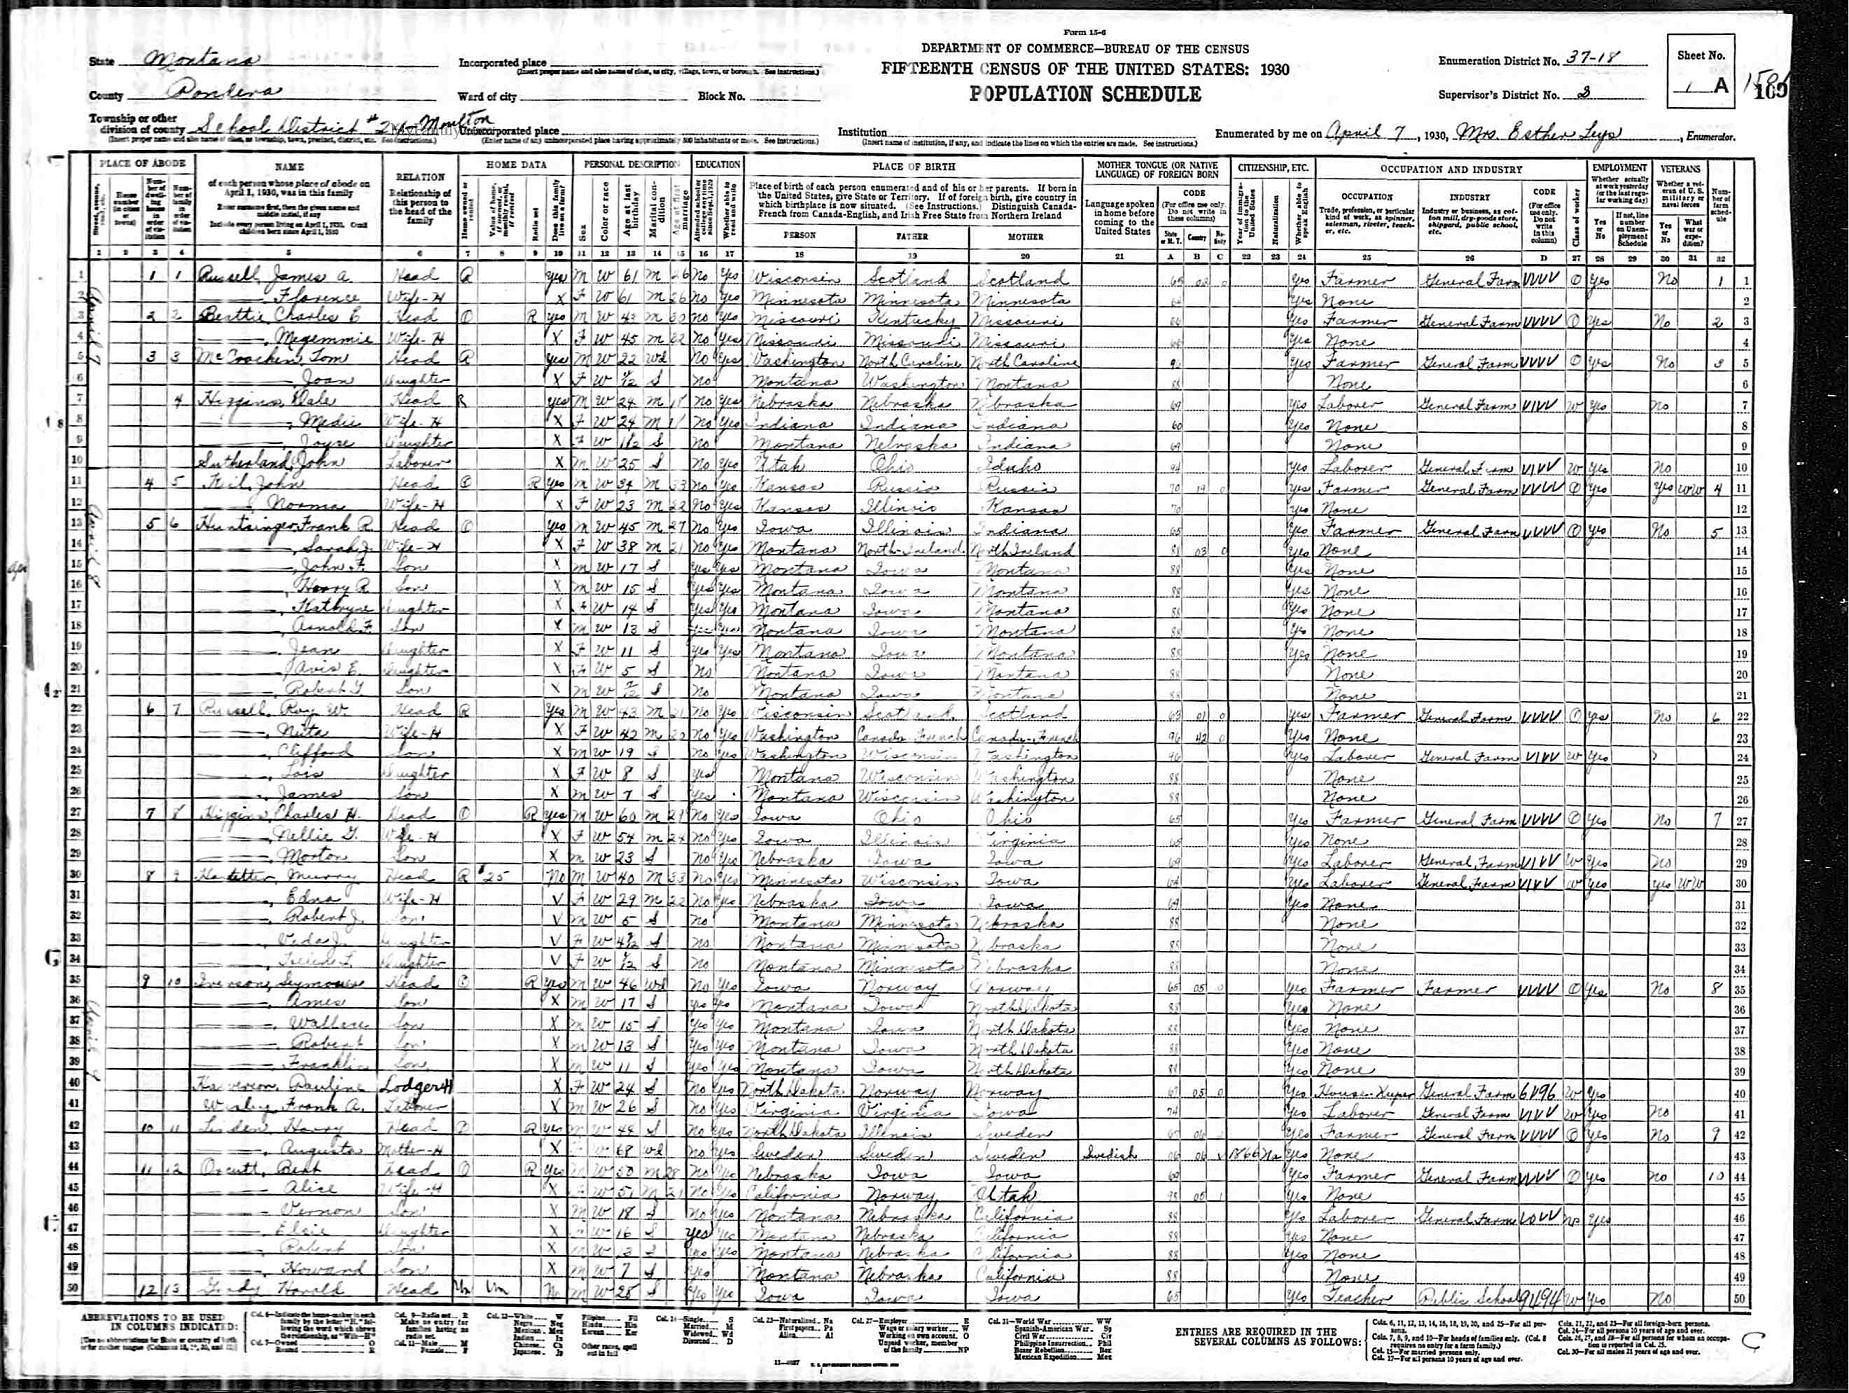 Montana pondera county ledger -  1930 Census Conrad Pondera County Montana Missing Mildred